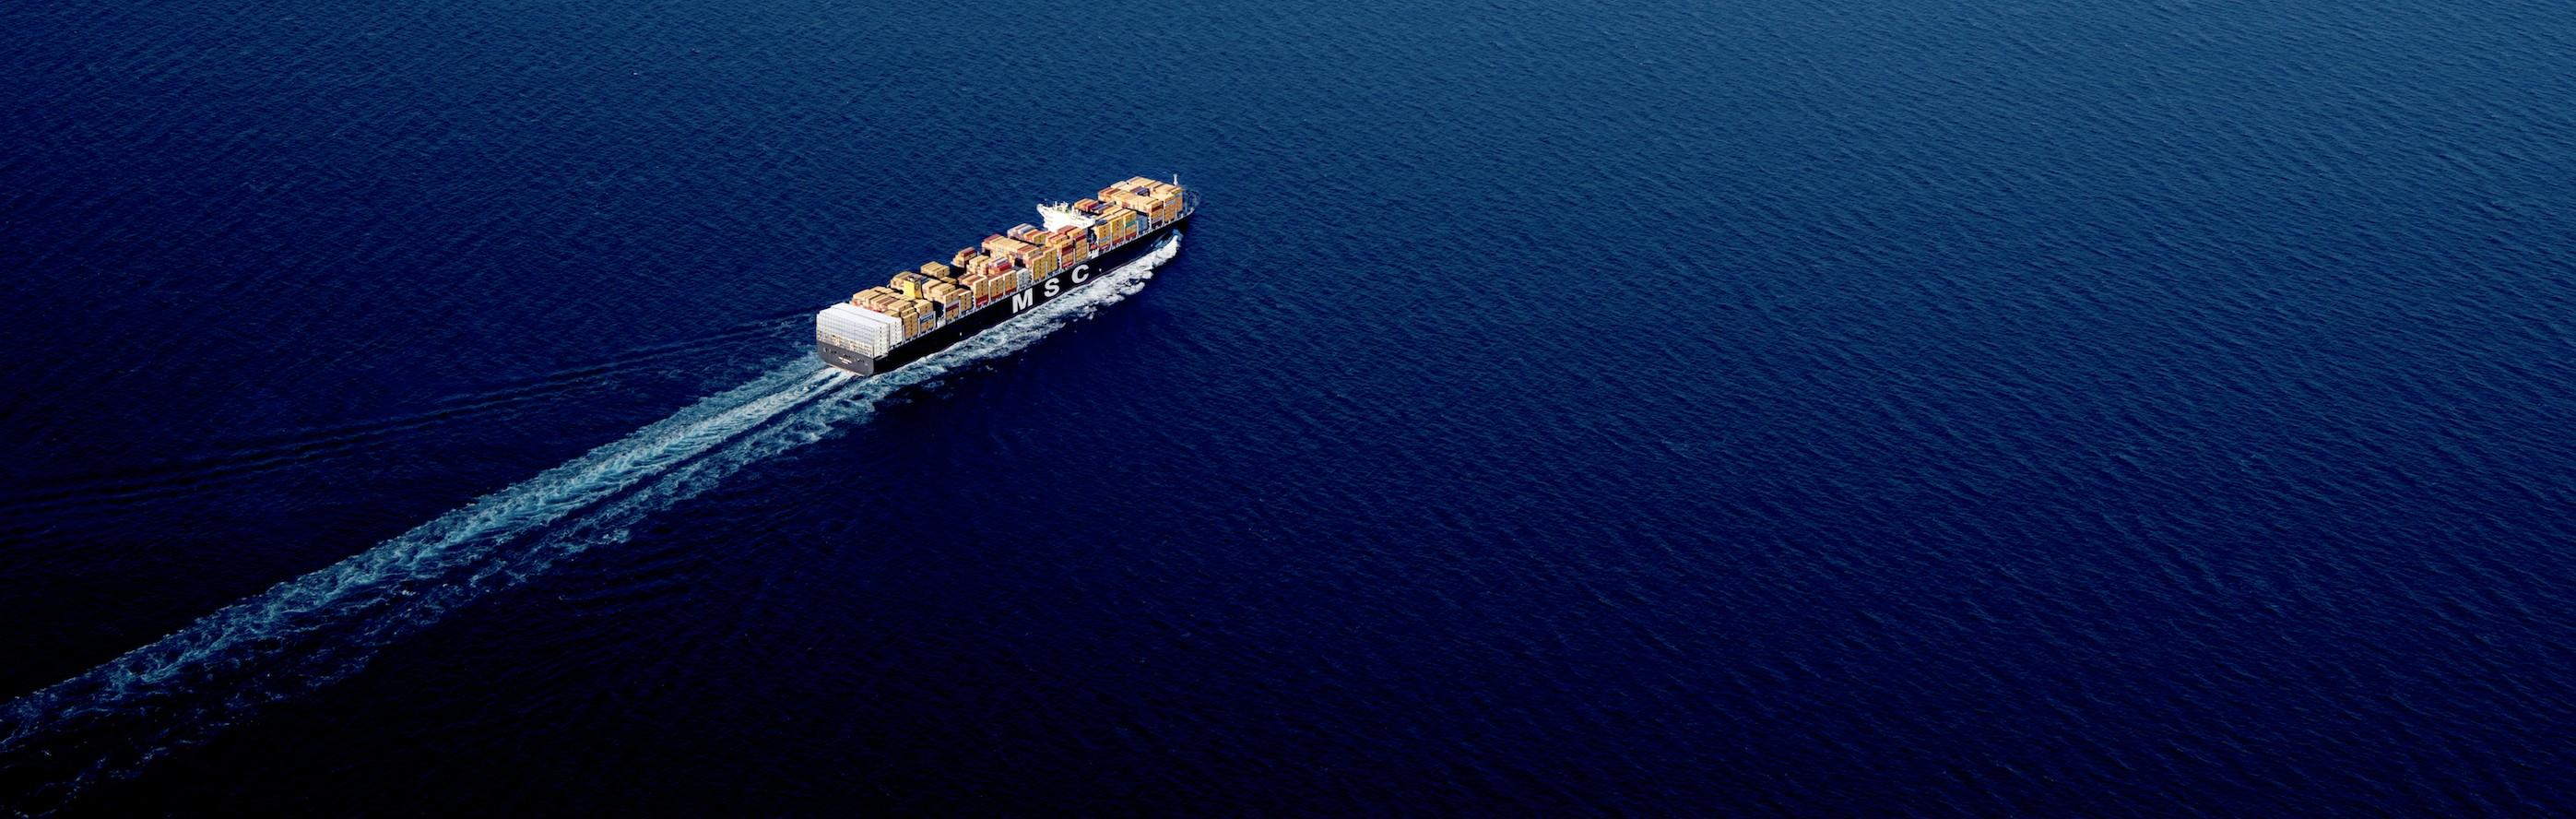 MSC Mediterranean Shipping Company | LinkedIn